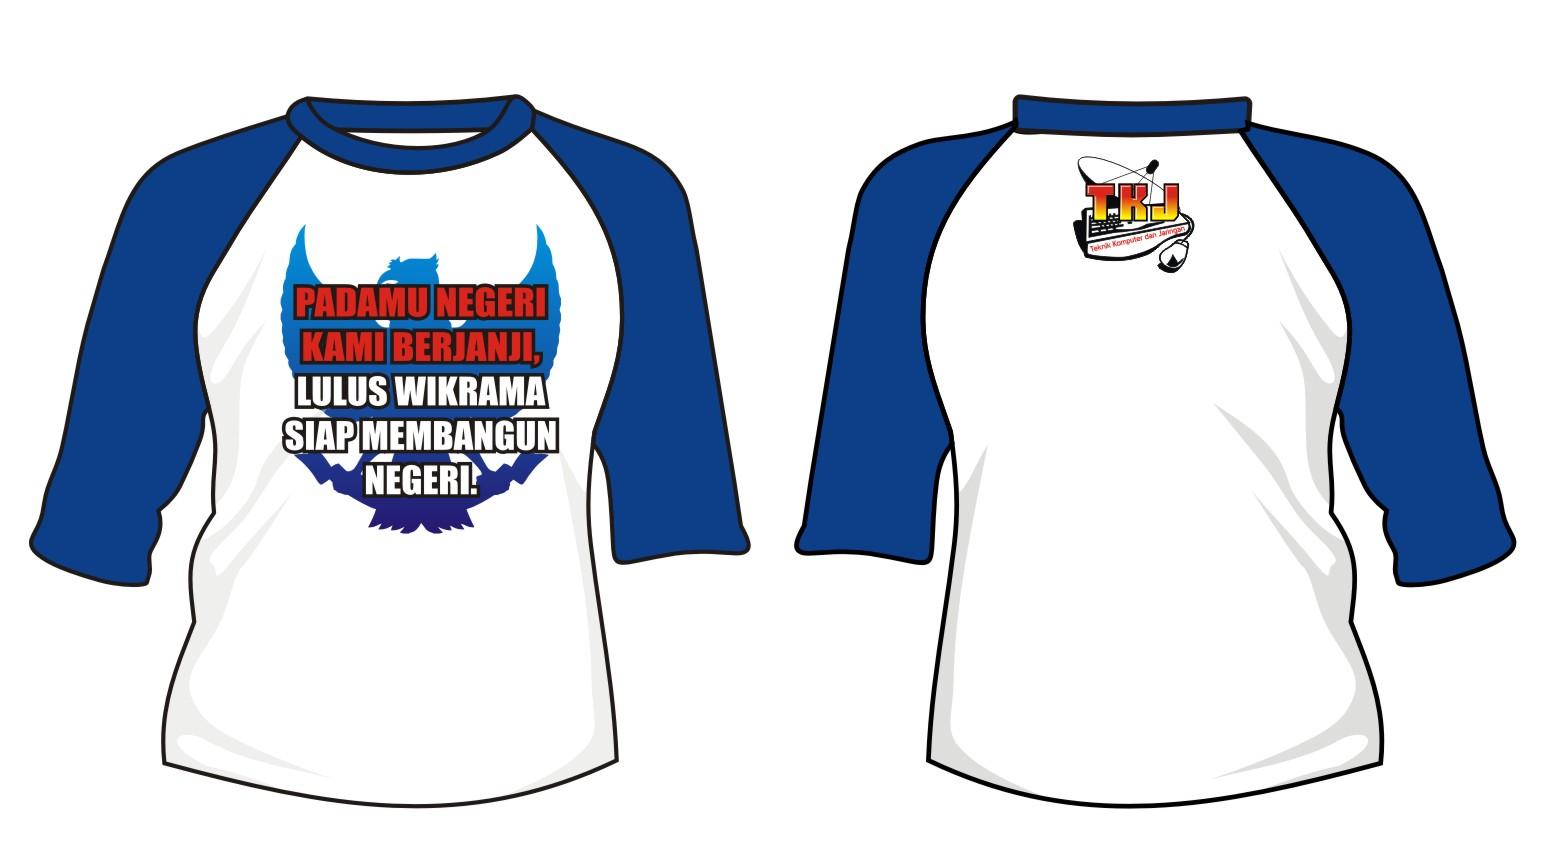 Desain t shirt raglan - Desain T Shirt Raglan Desain T Shirt Raglan 19